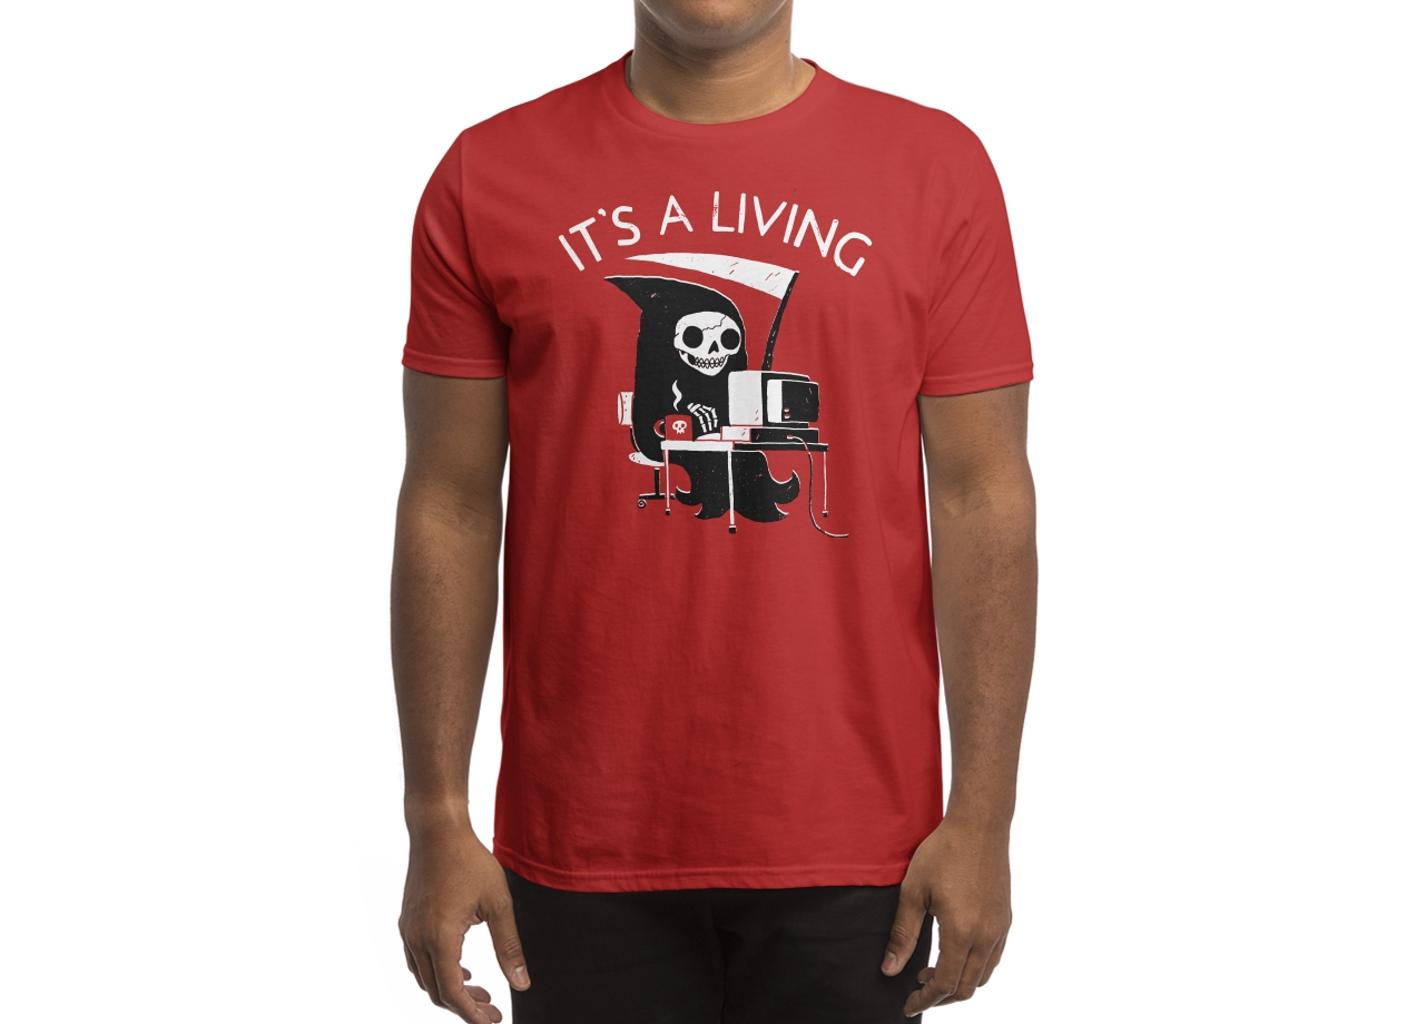 Threadless: It's A Living